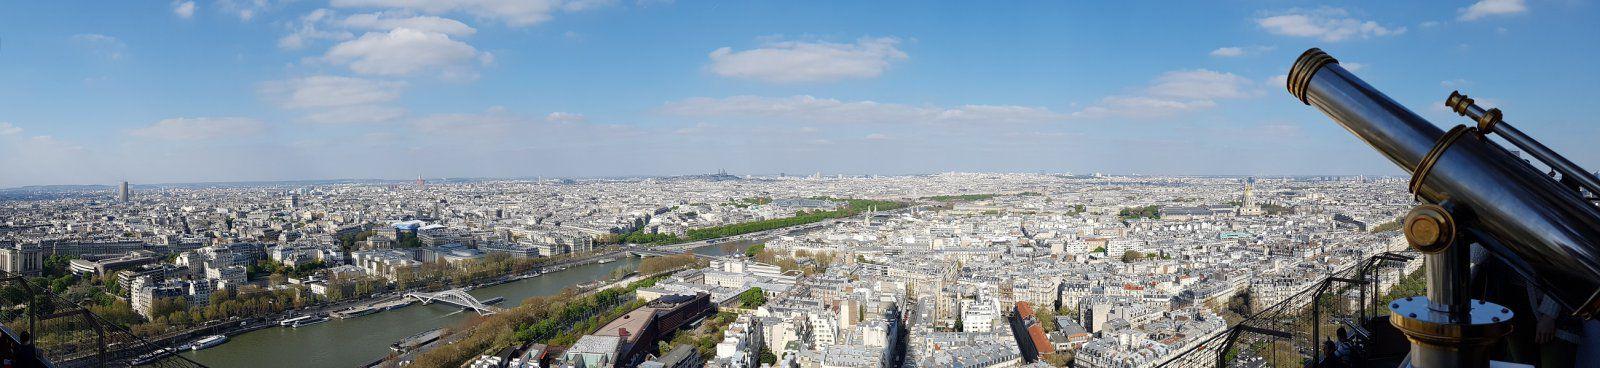 Eiffel Tower view.jpg